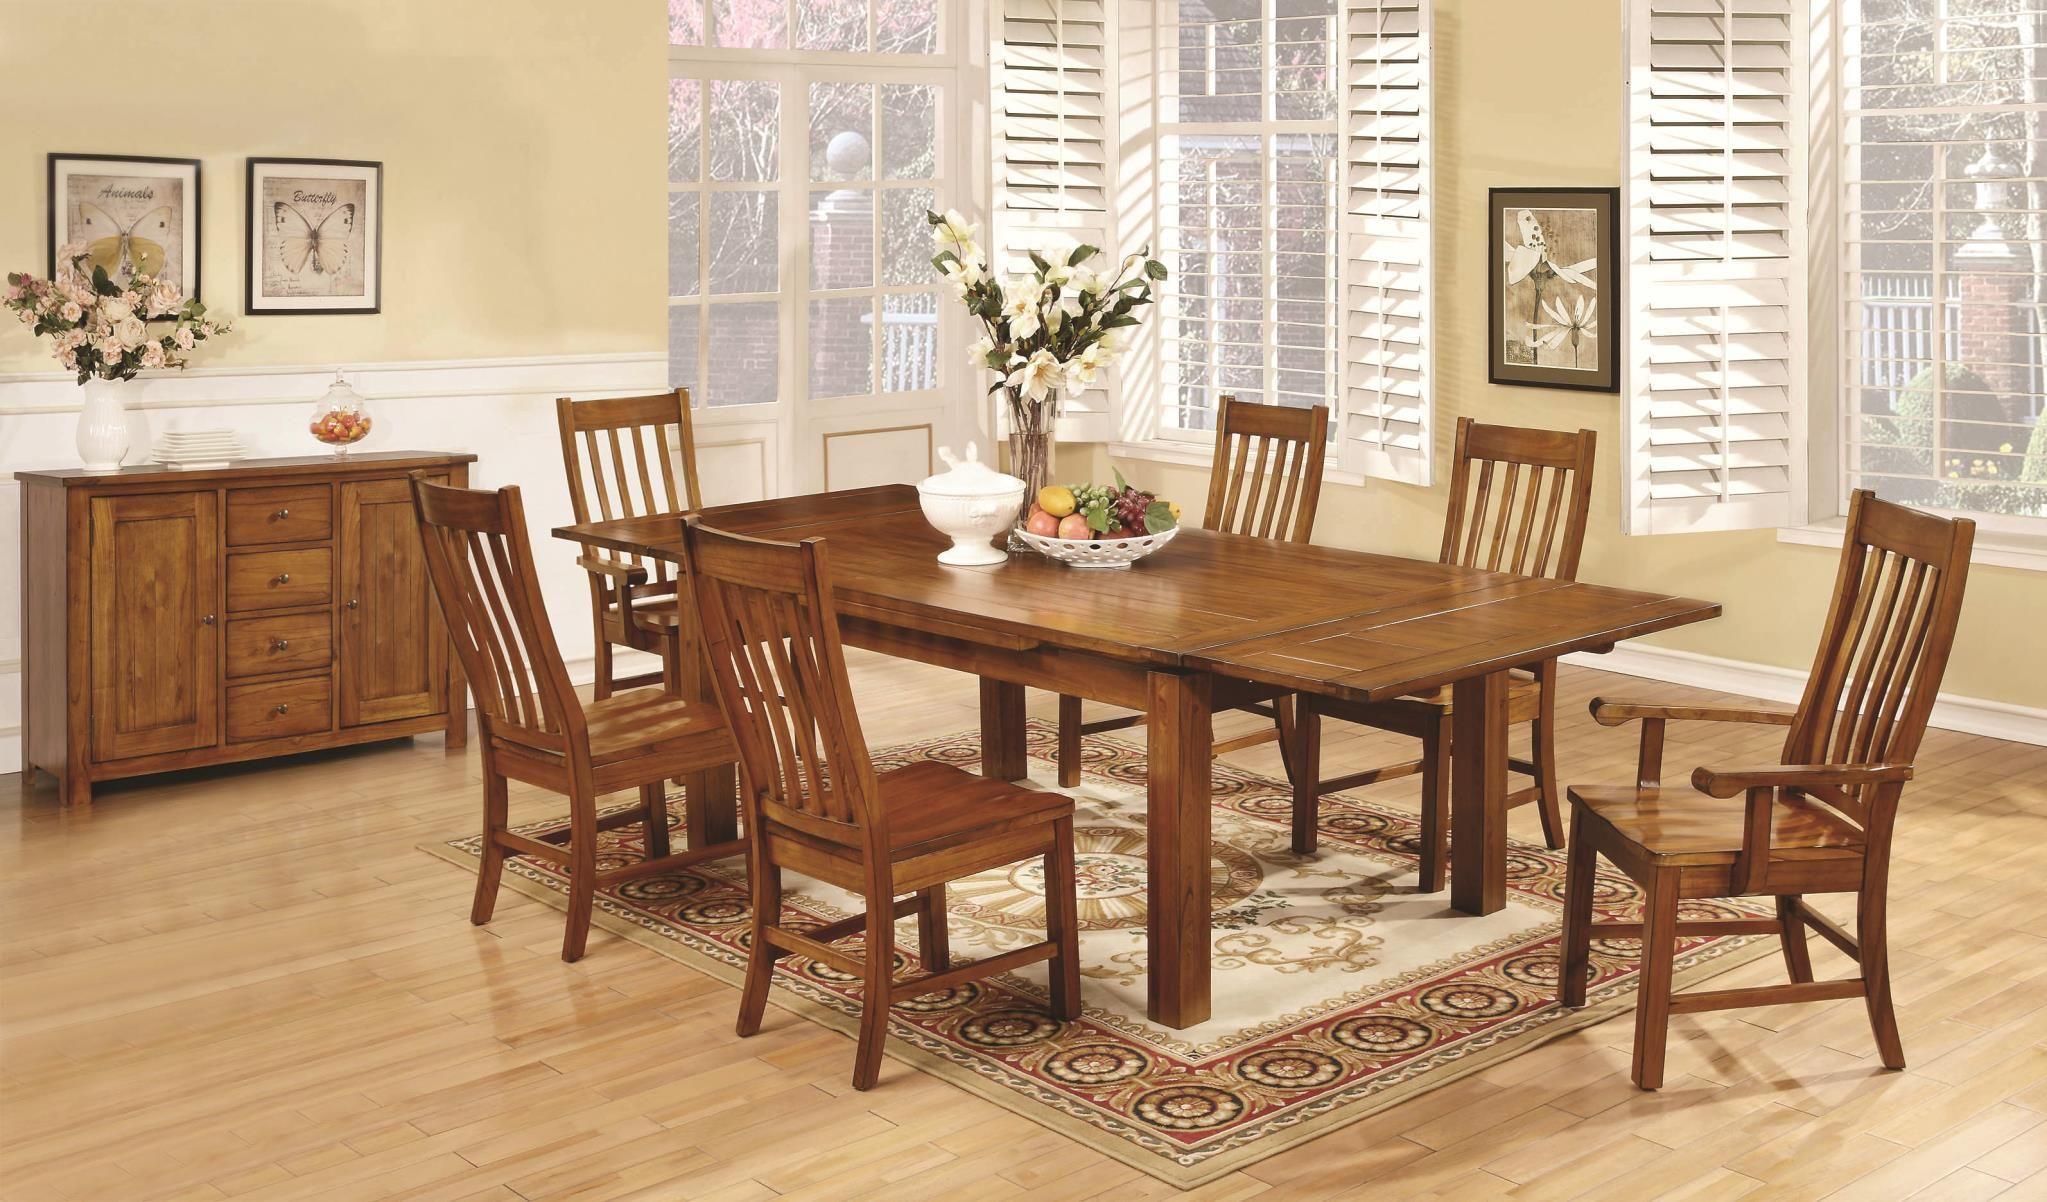 Products Tei Furniture Hardwood Furniture Wholesale Furniture